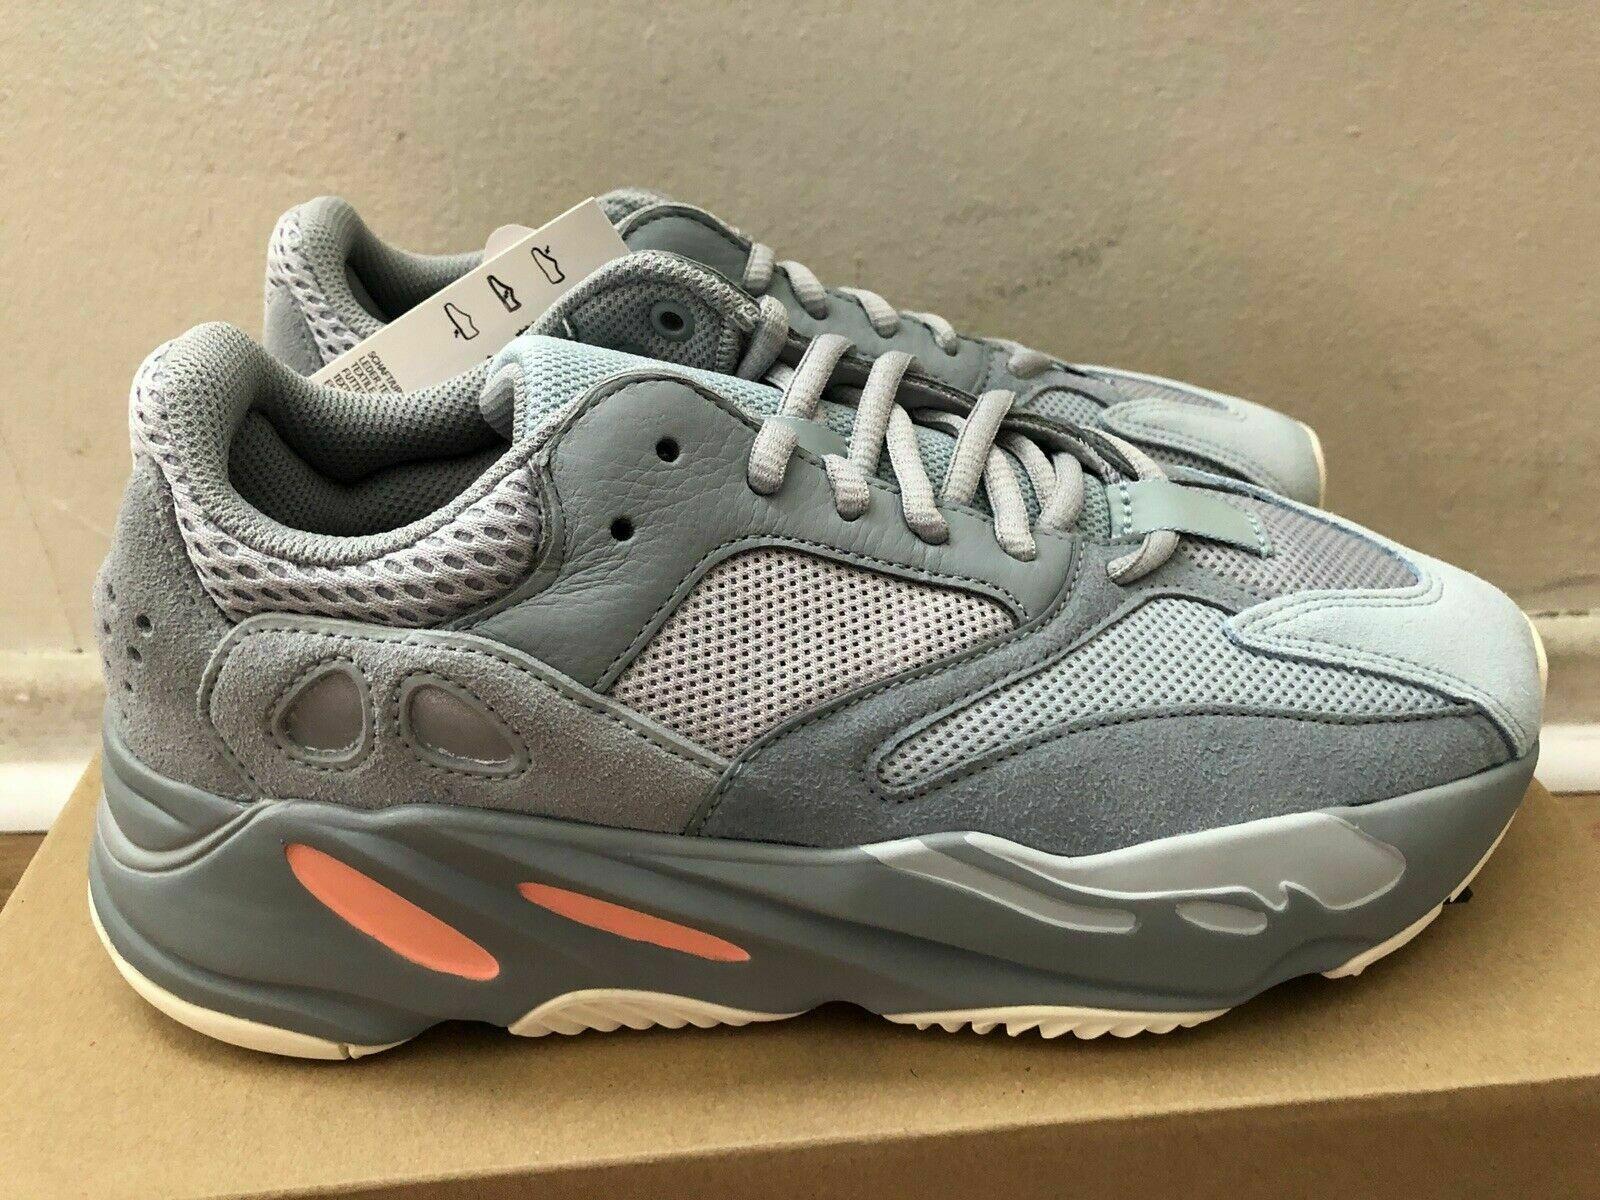 Adidas Yeezy Boost 700 INERTIA Grey YZY